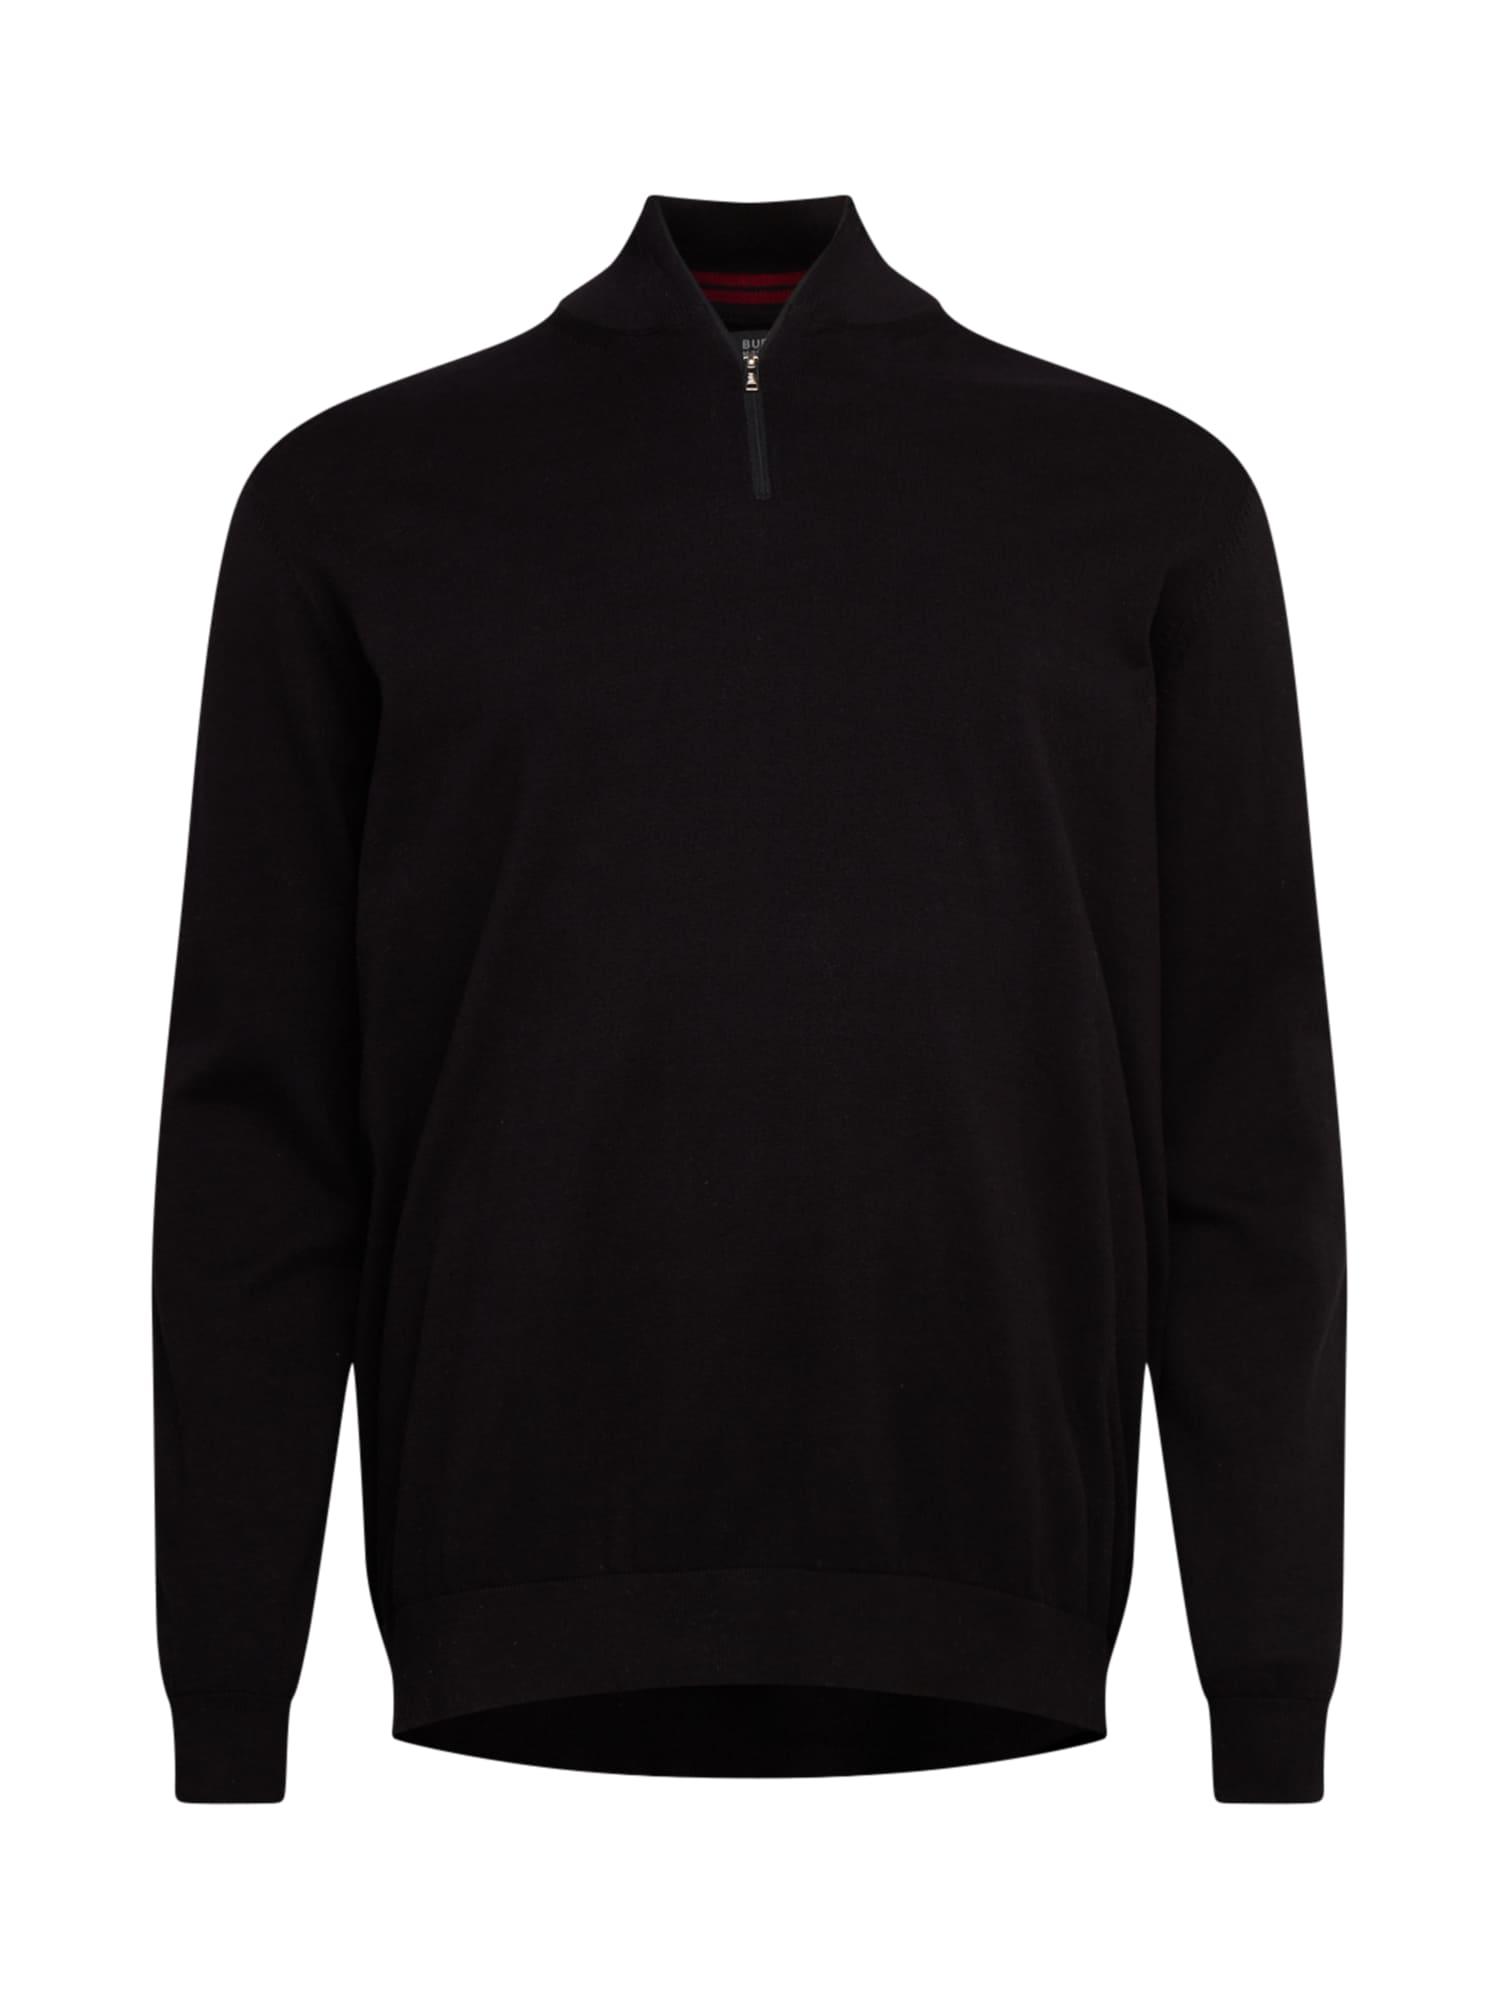 BURTON MENSWEAR LONDON (Big & Tall) Megztinis juoda